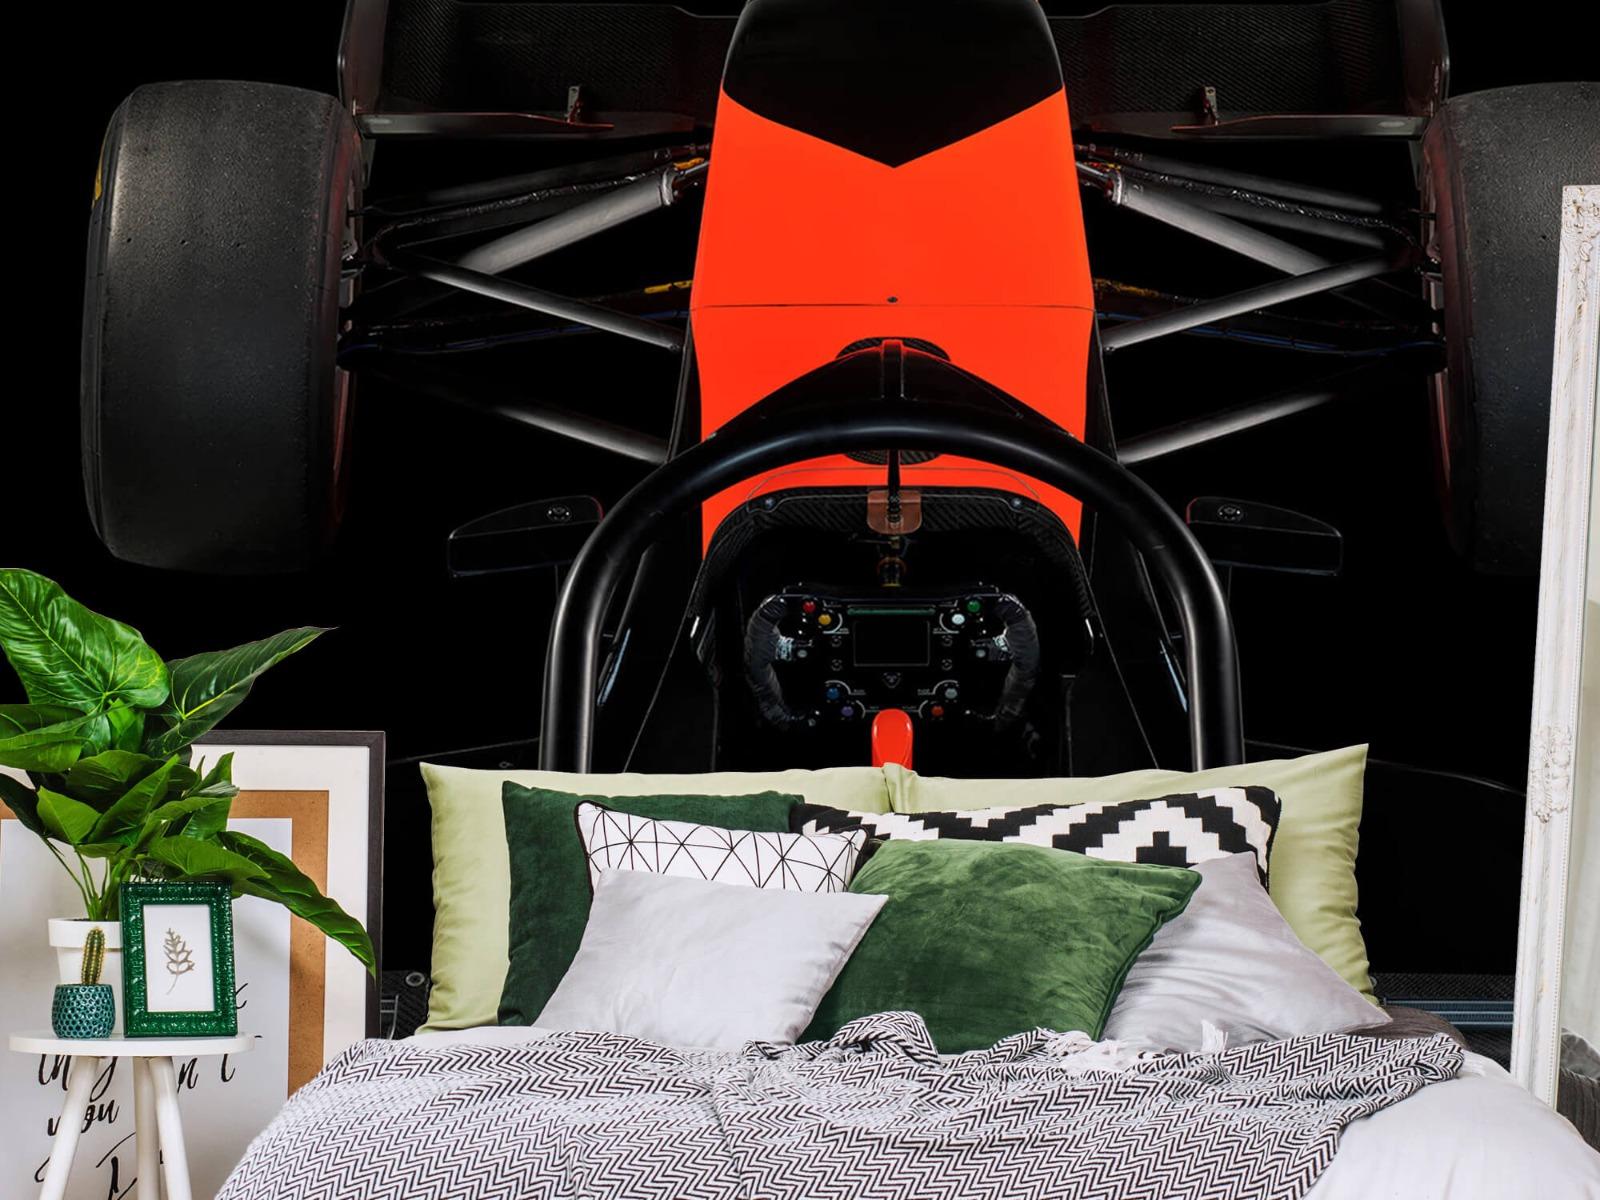 Sportauto's - Formule 3 - Cockpit view - dark - Tienerkamer 12